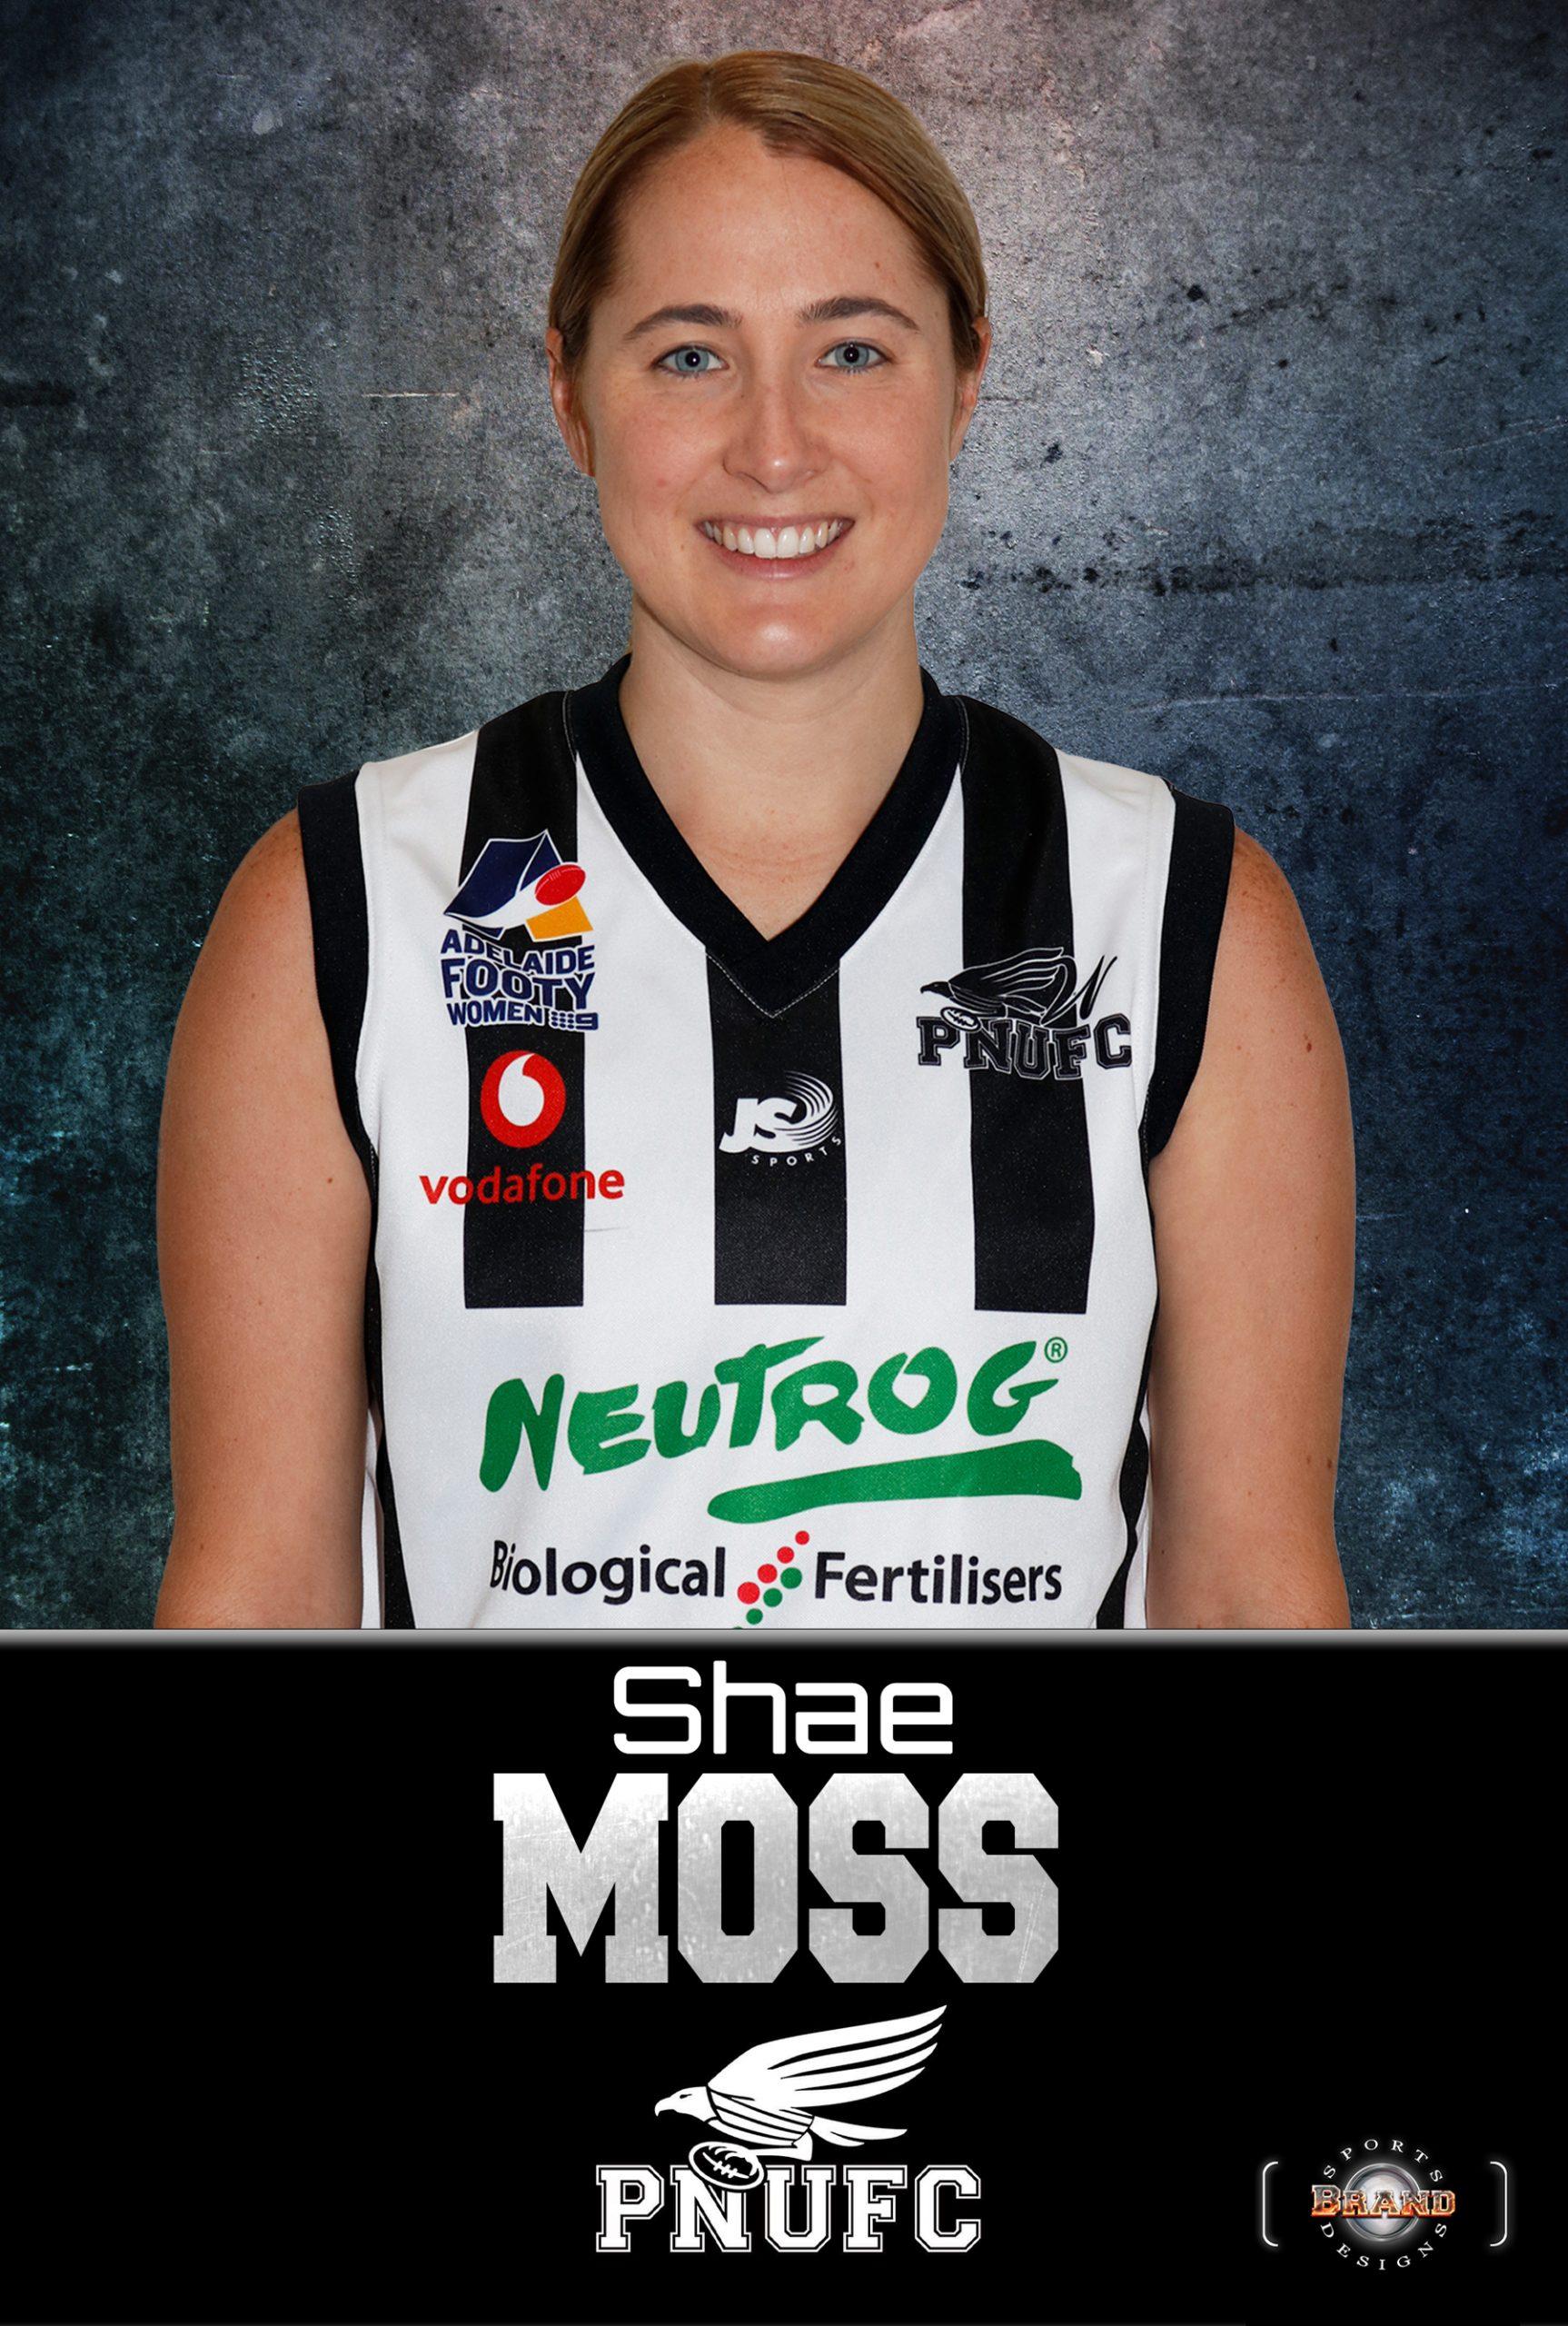 Shae Moss